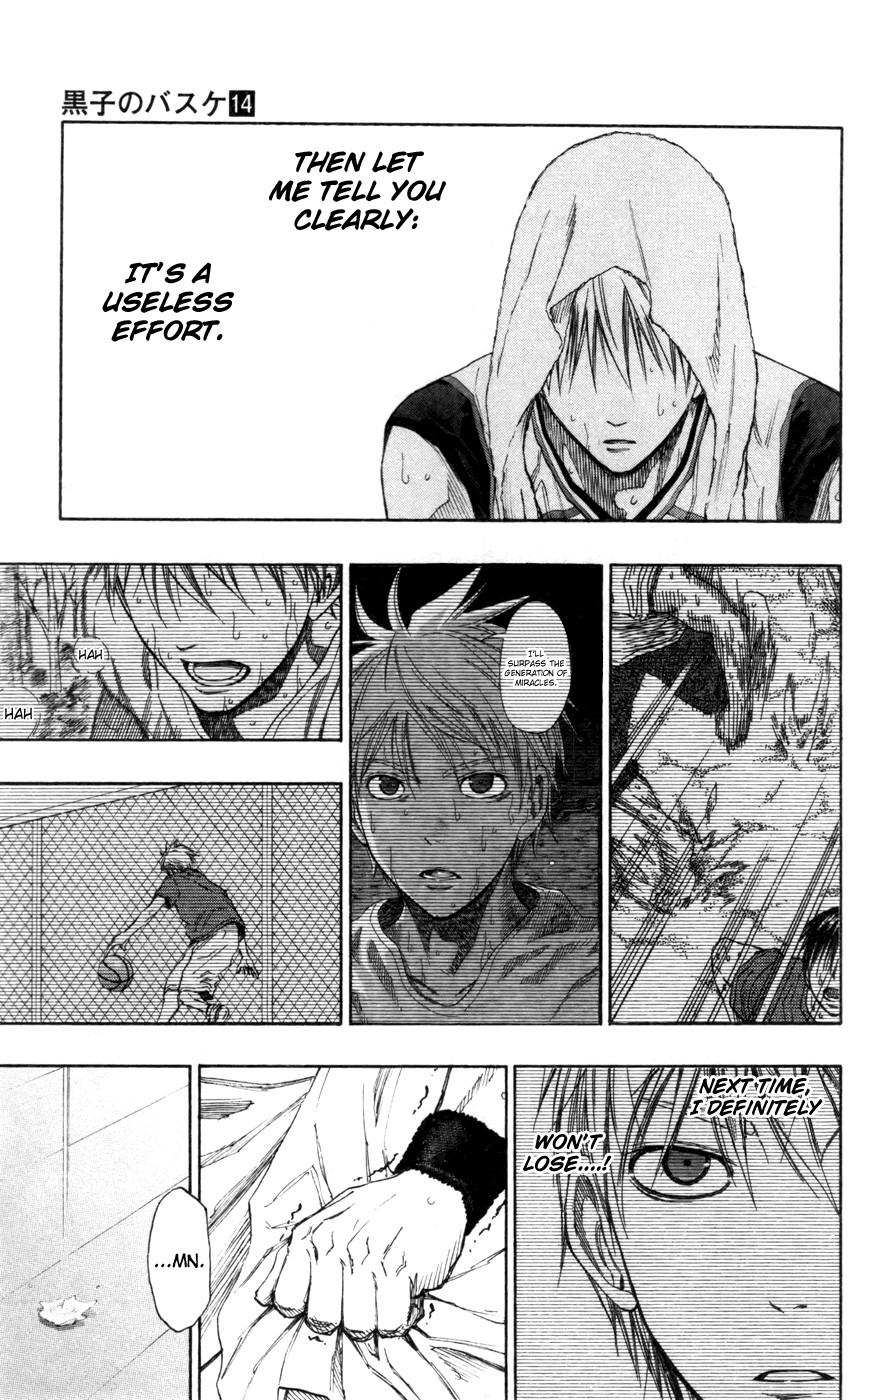 Kuroko no Basket Manga Chapter 120 - Image 17